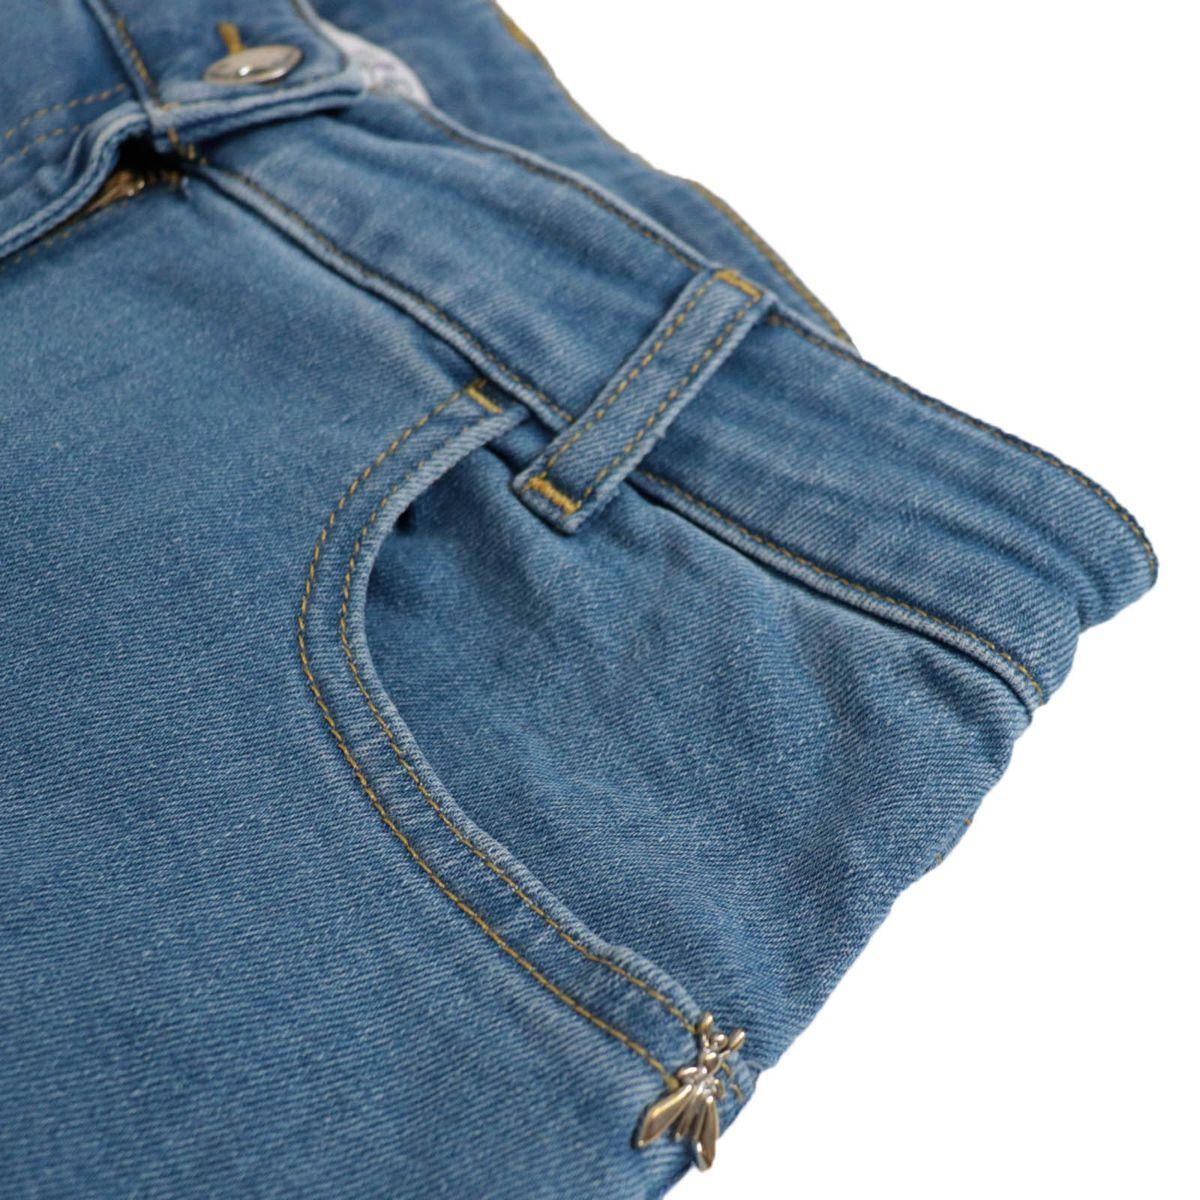 Wide stretch denim jeans with frayed edges Blue denim Patrizia Pepe